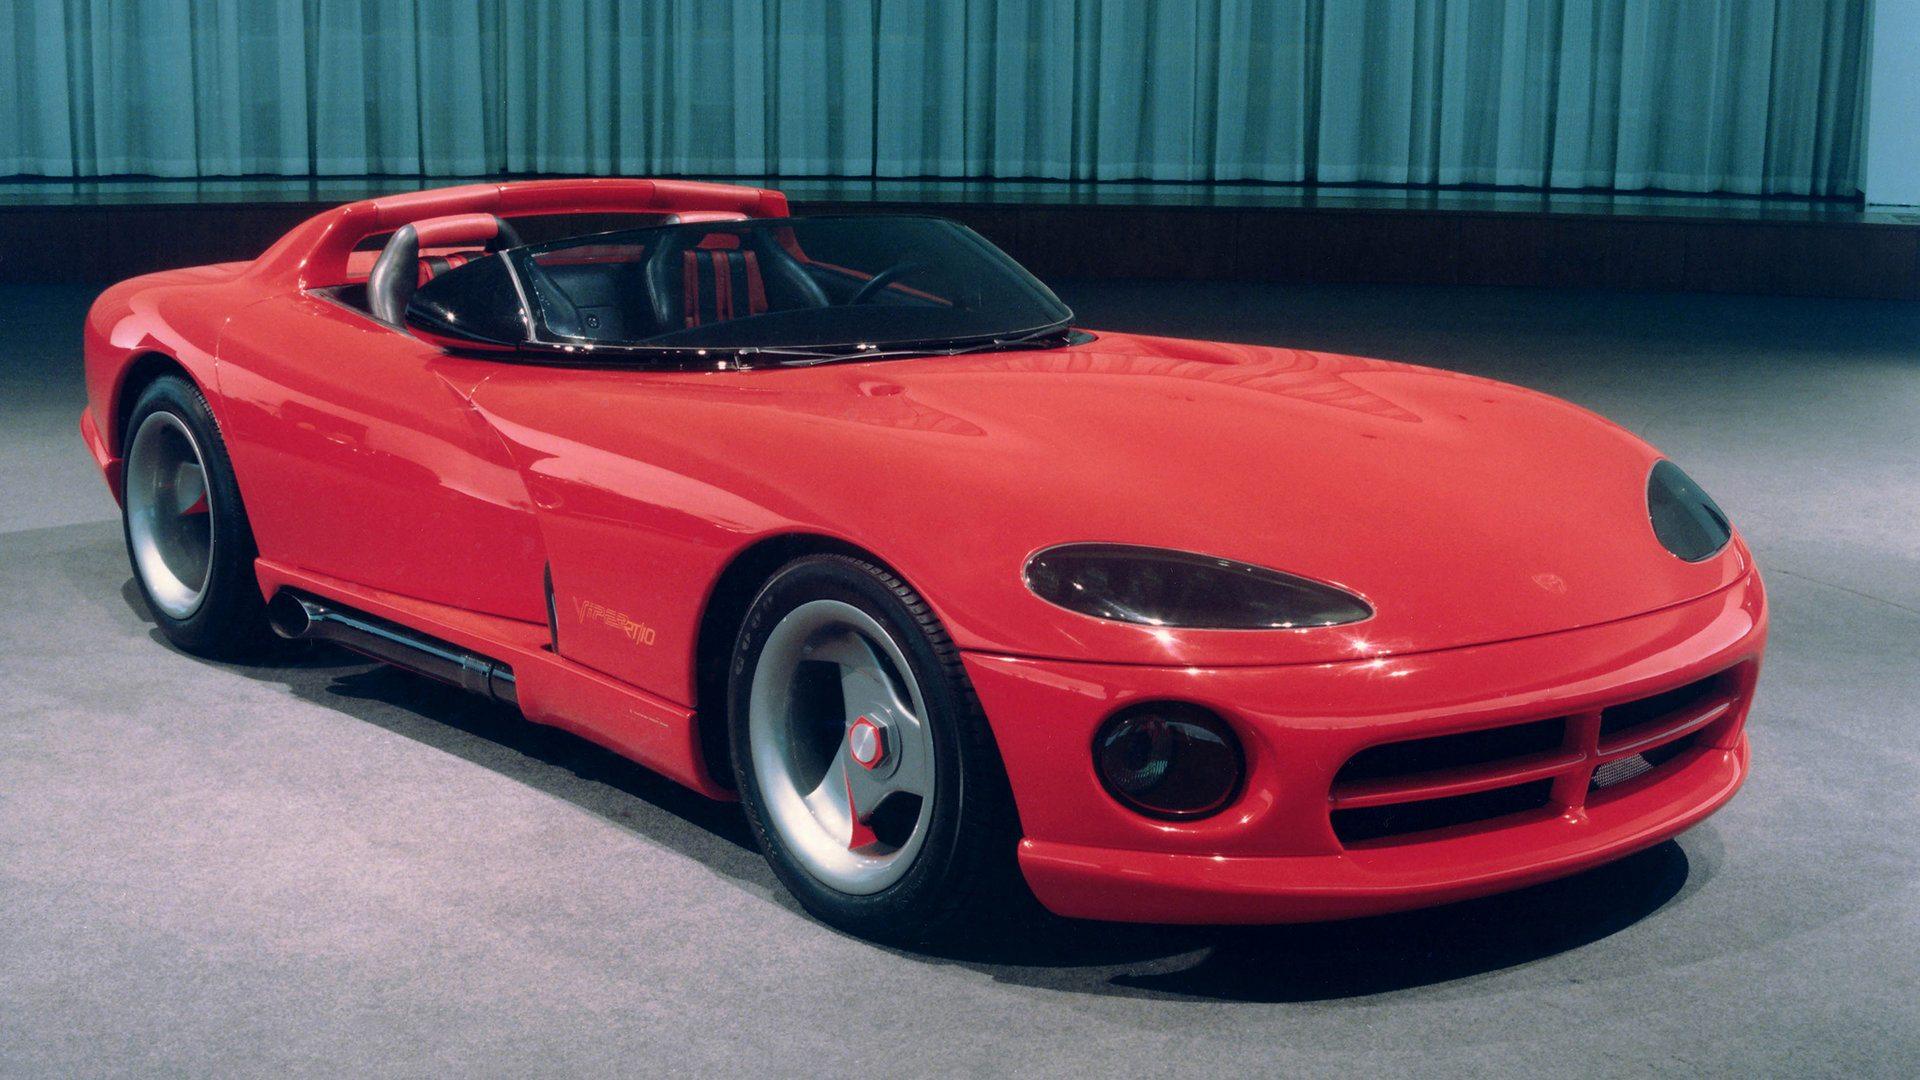 Dodge Viper RT 10 concept